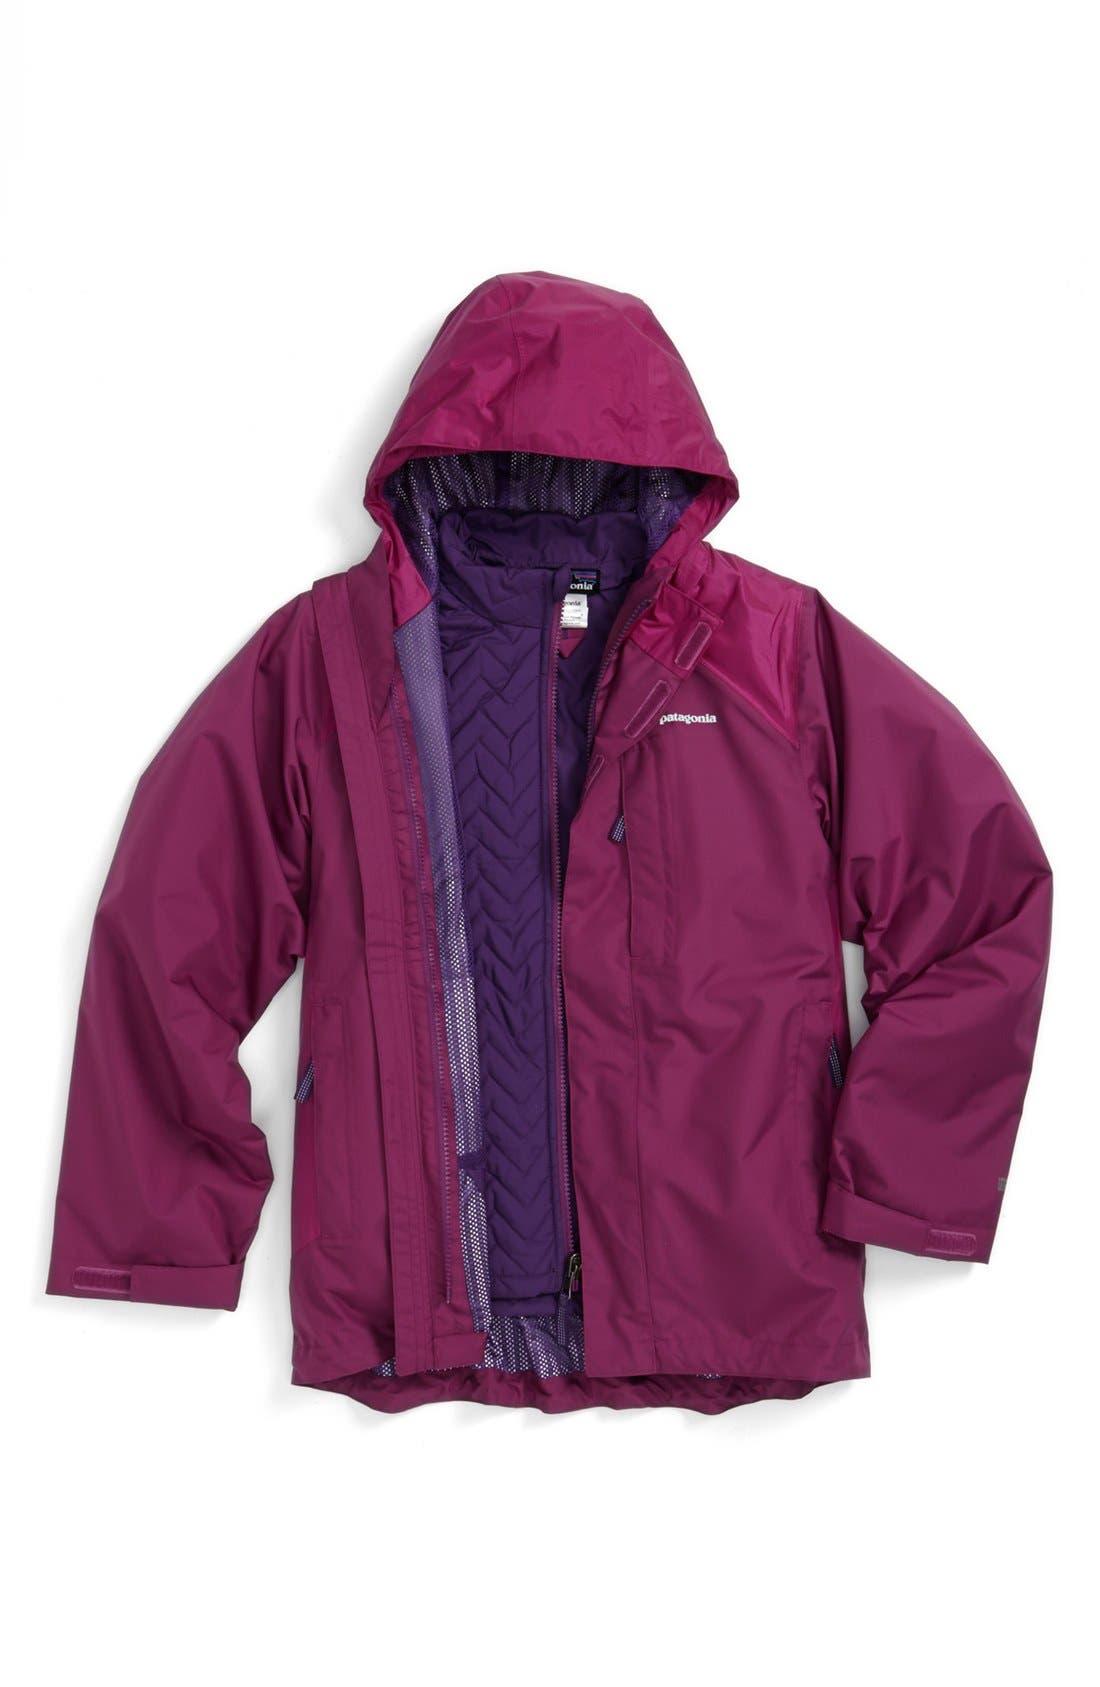 Alternate Image 1 Selected - Patagonia Waterproof 3-in-1 Snowsport Jacket (Little Girls & Big Girls)